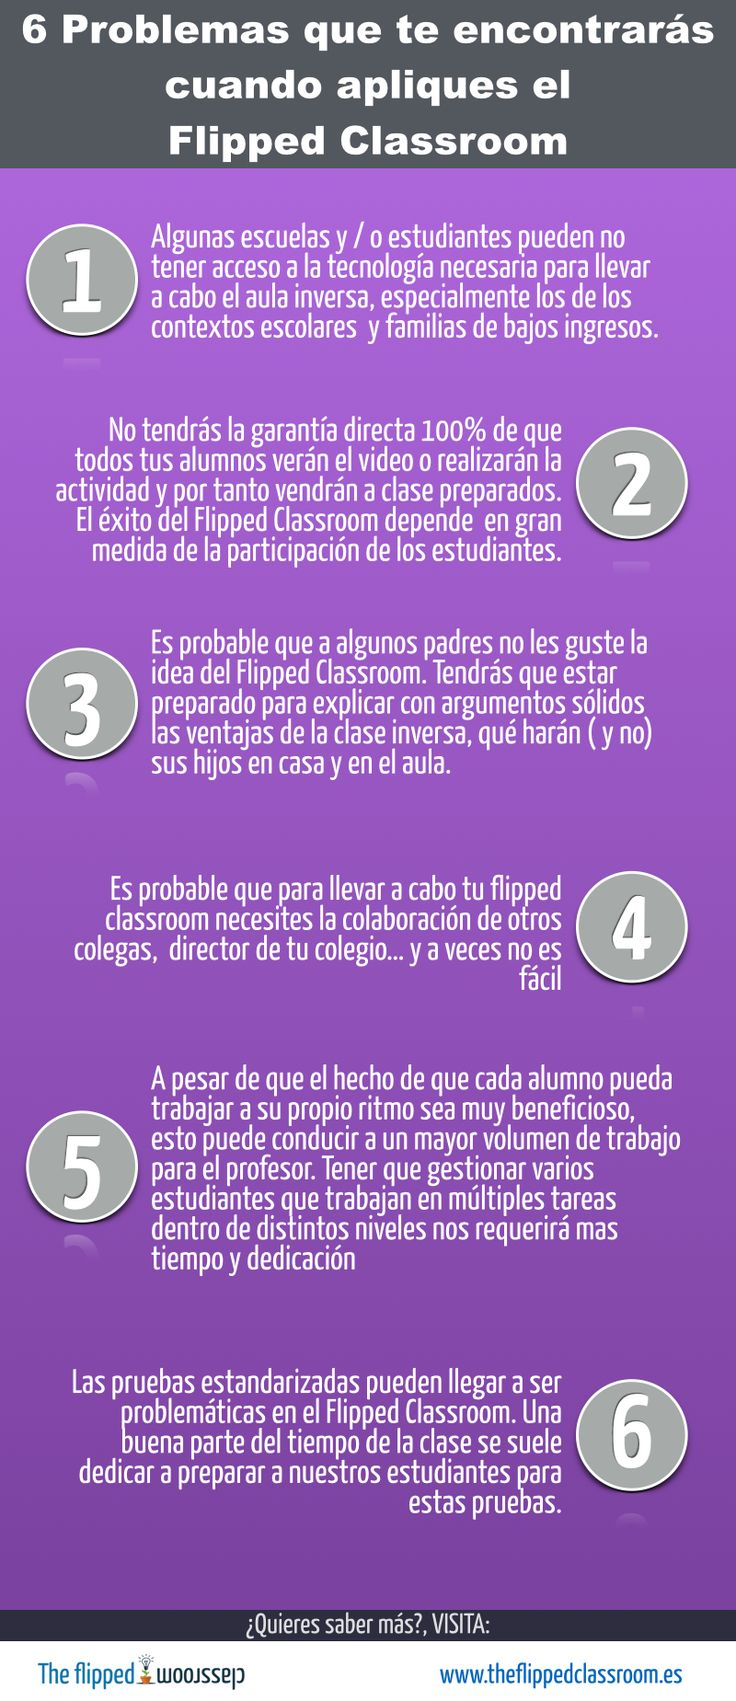 6 problemas que puedes encontrar para aplicar #FlippedClassroom #edtech #sekelcastillo